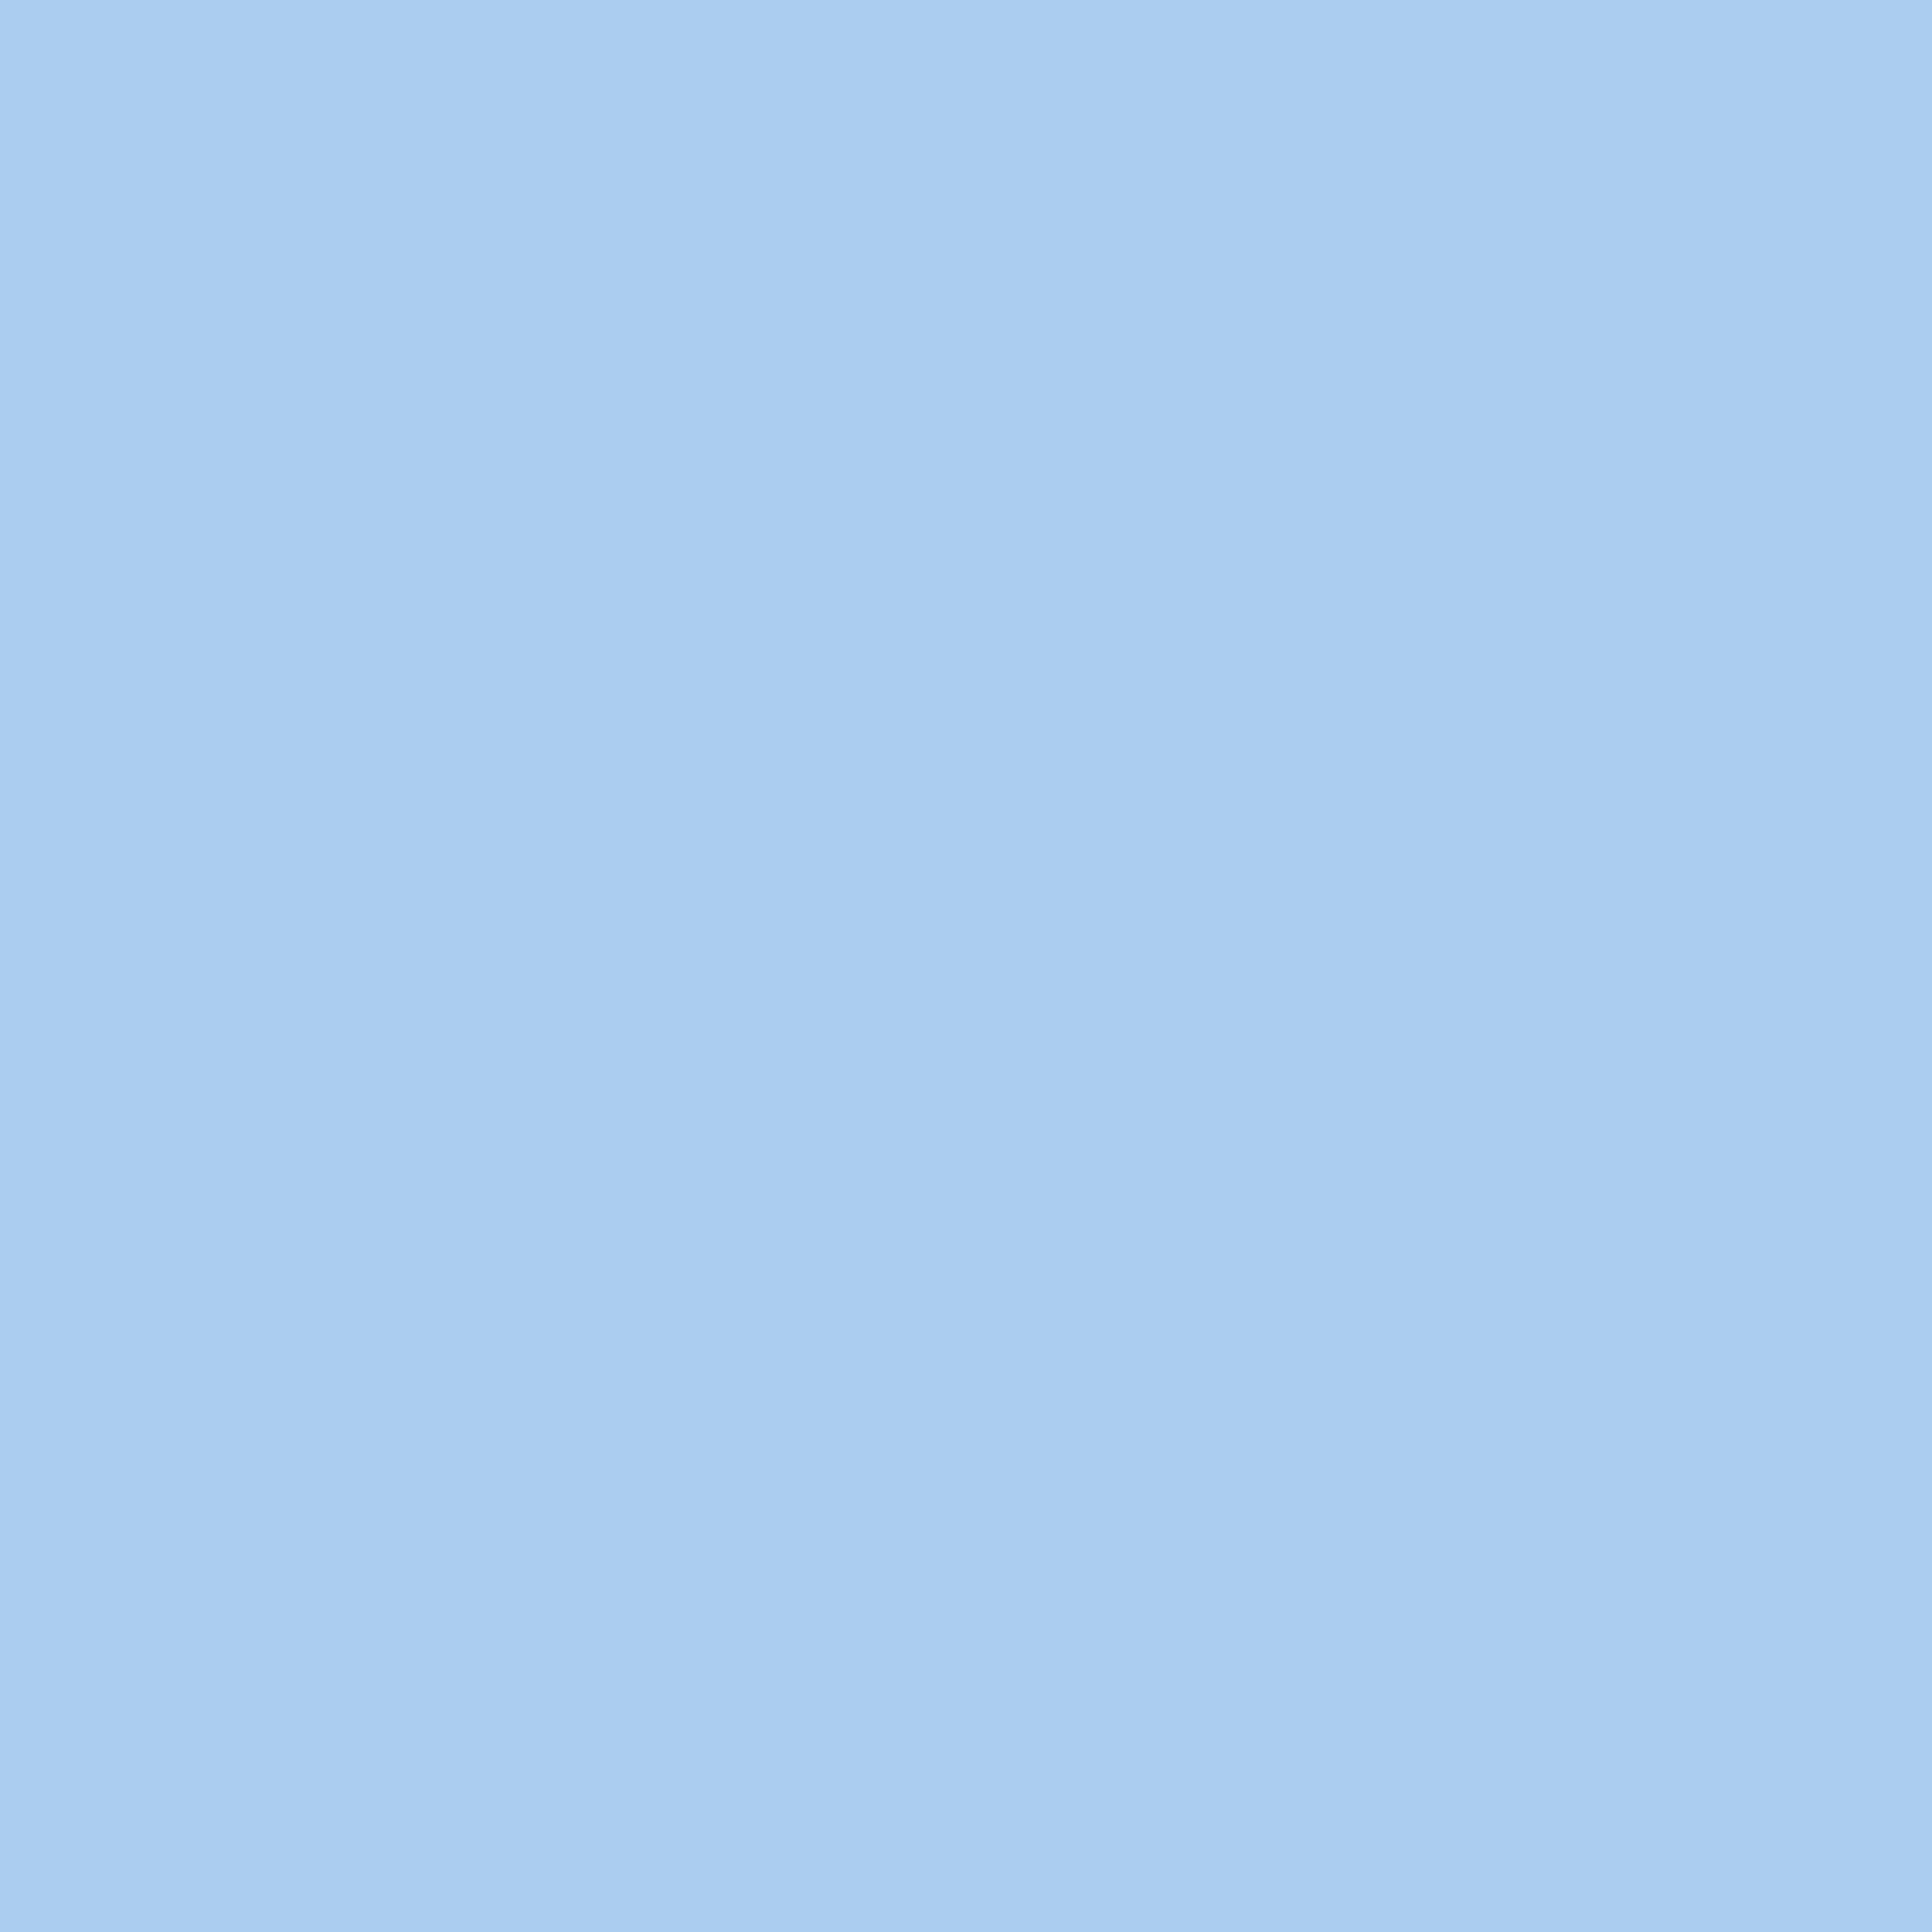 2048x2048 Pale Cornflower Blue Solid Color Background